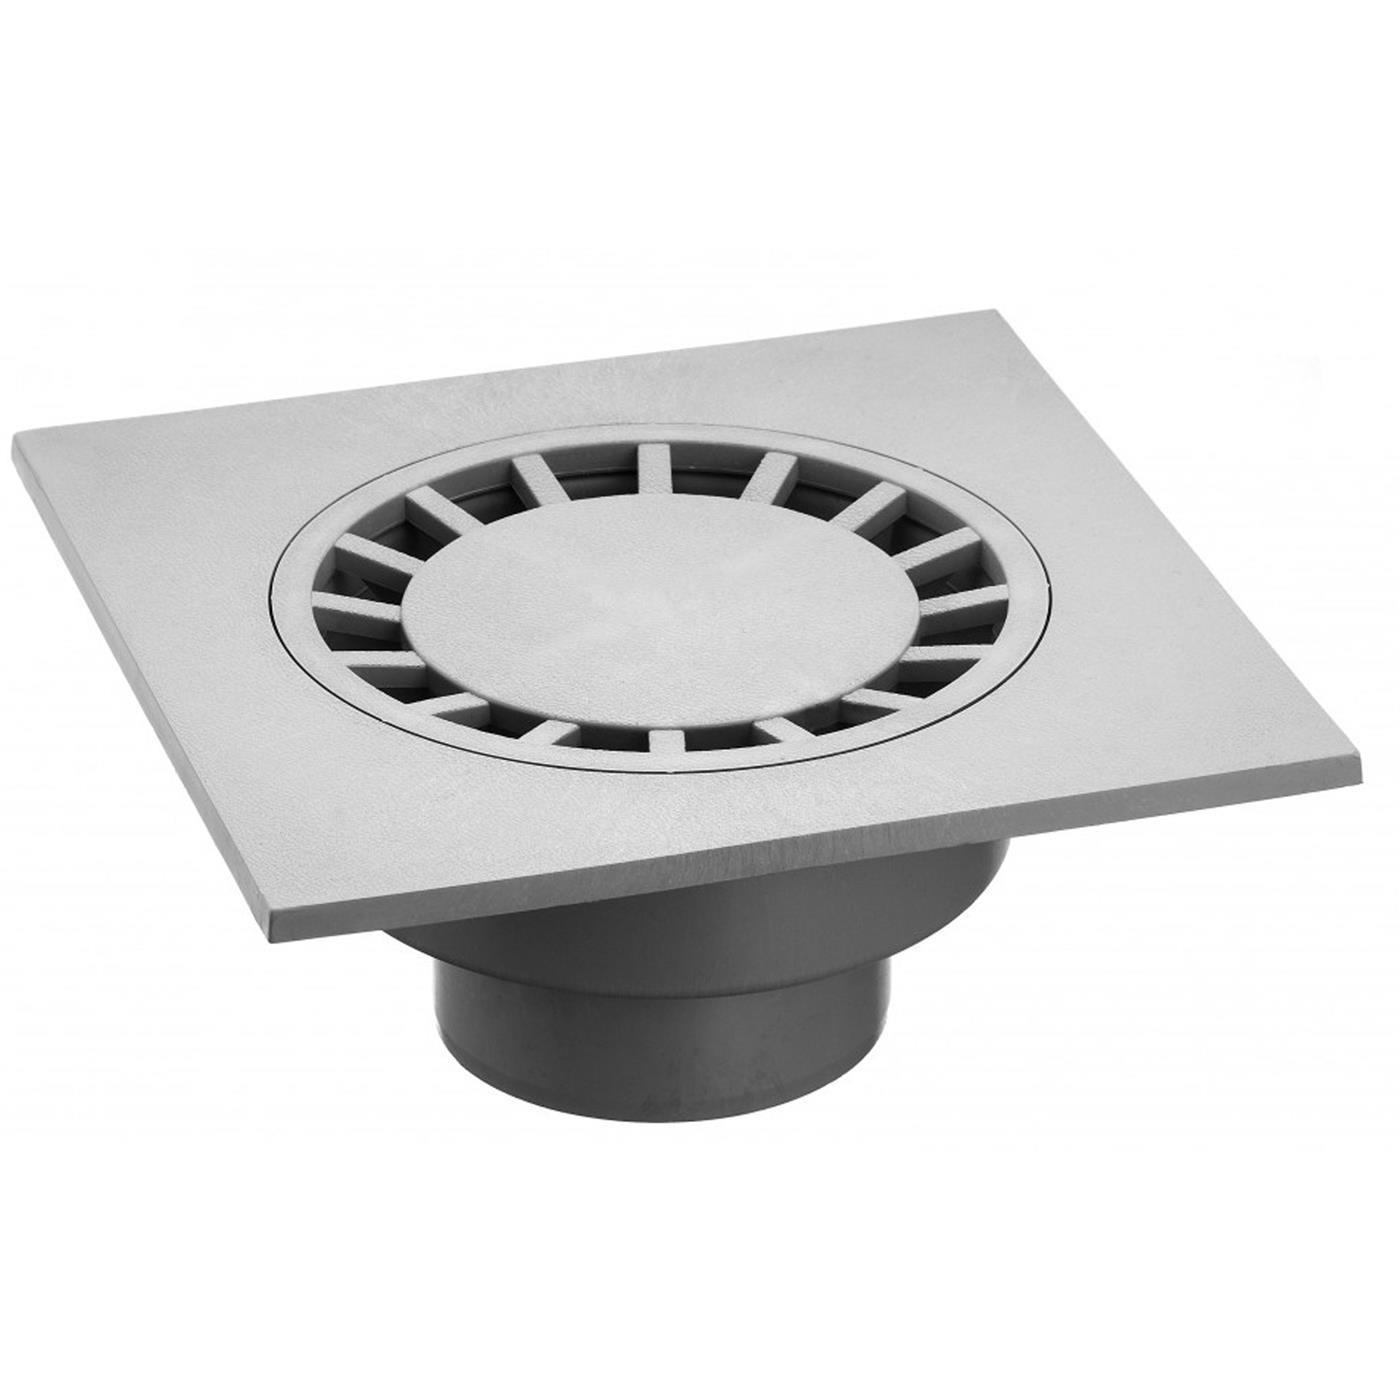 Hofablauf 30x30 cm lichtgrau ˜ RAL 7035 D 100 mm senkrecht PVC